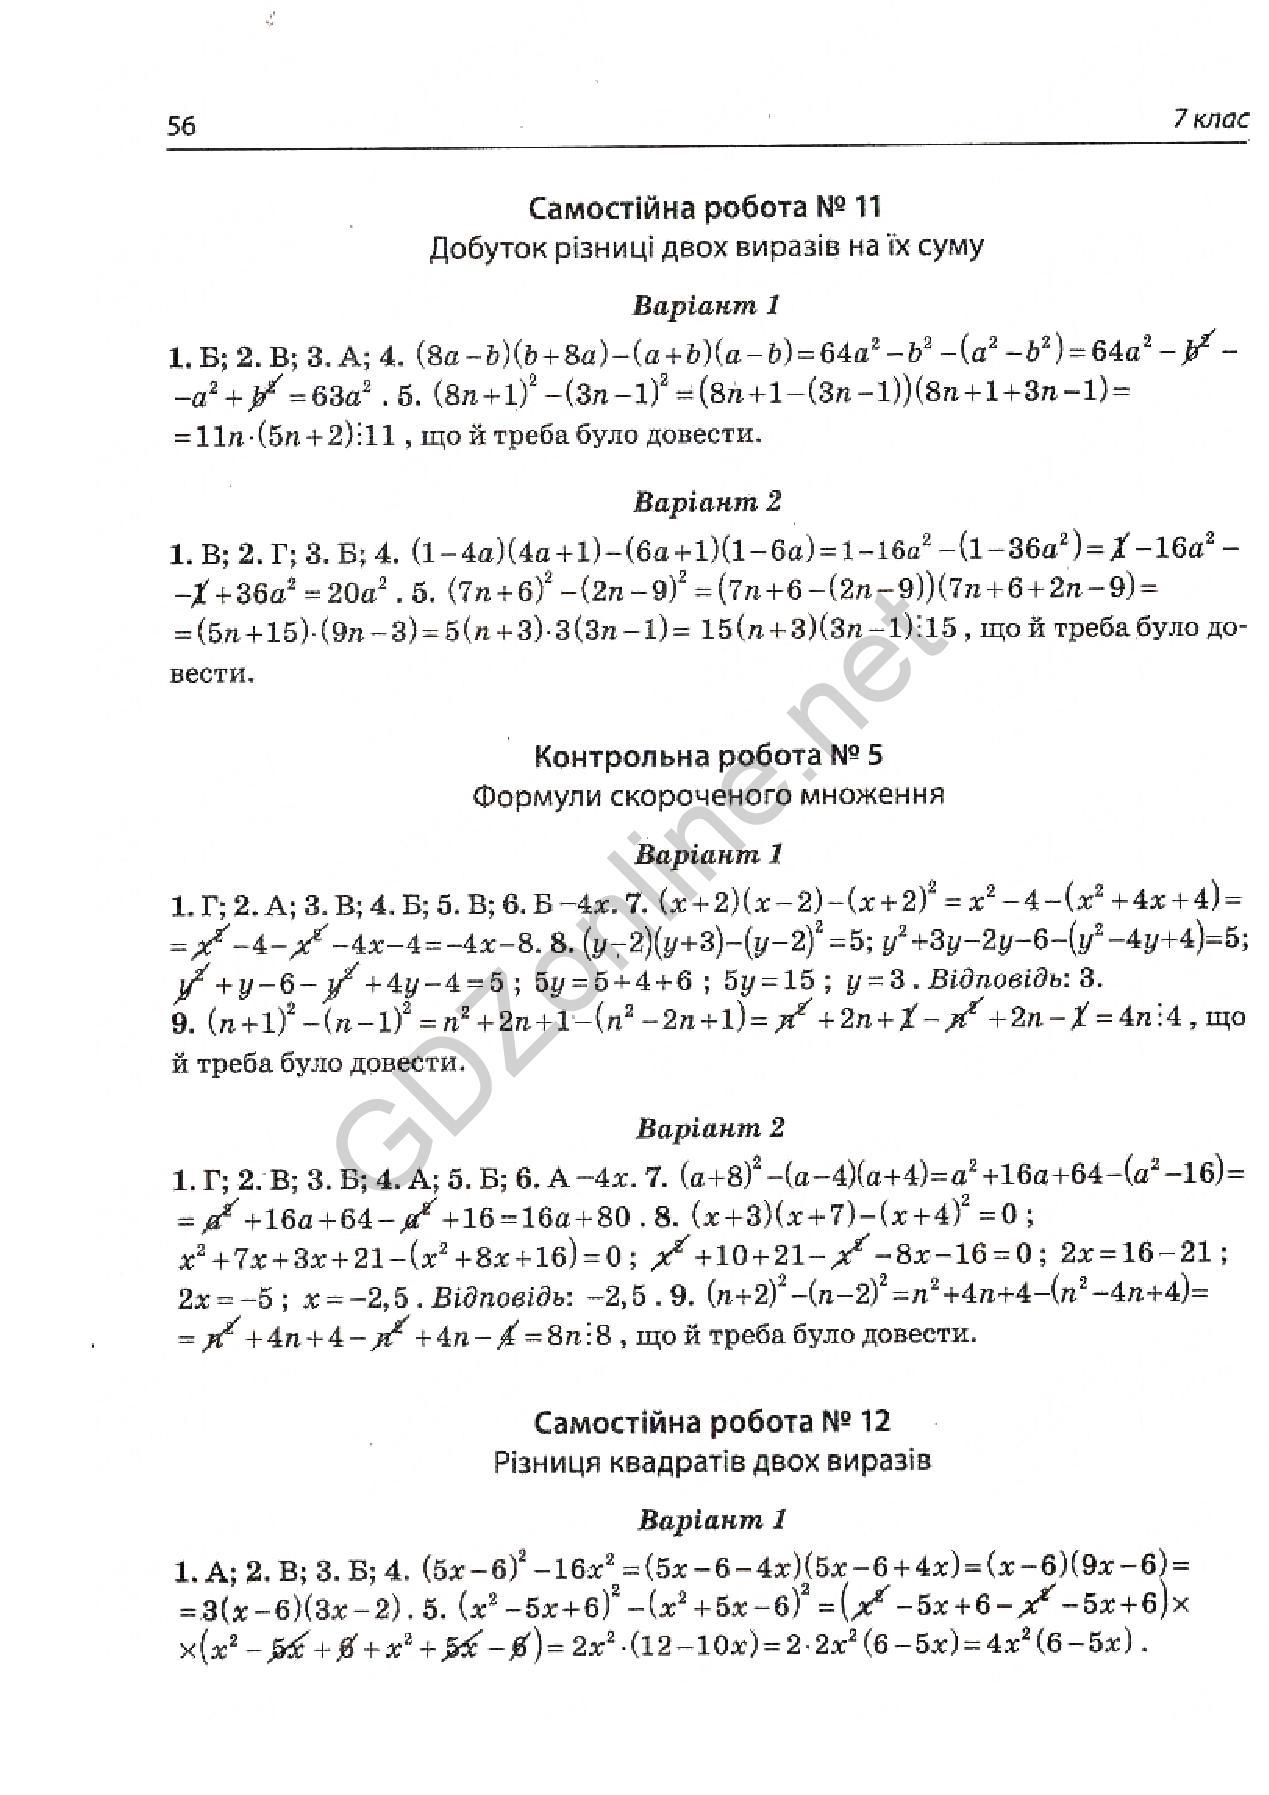 итоговый тест по алгебре 10 класс: